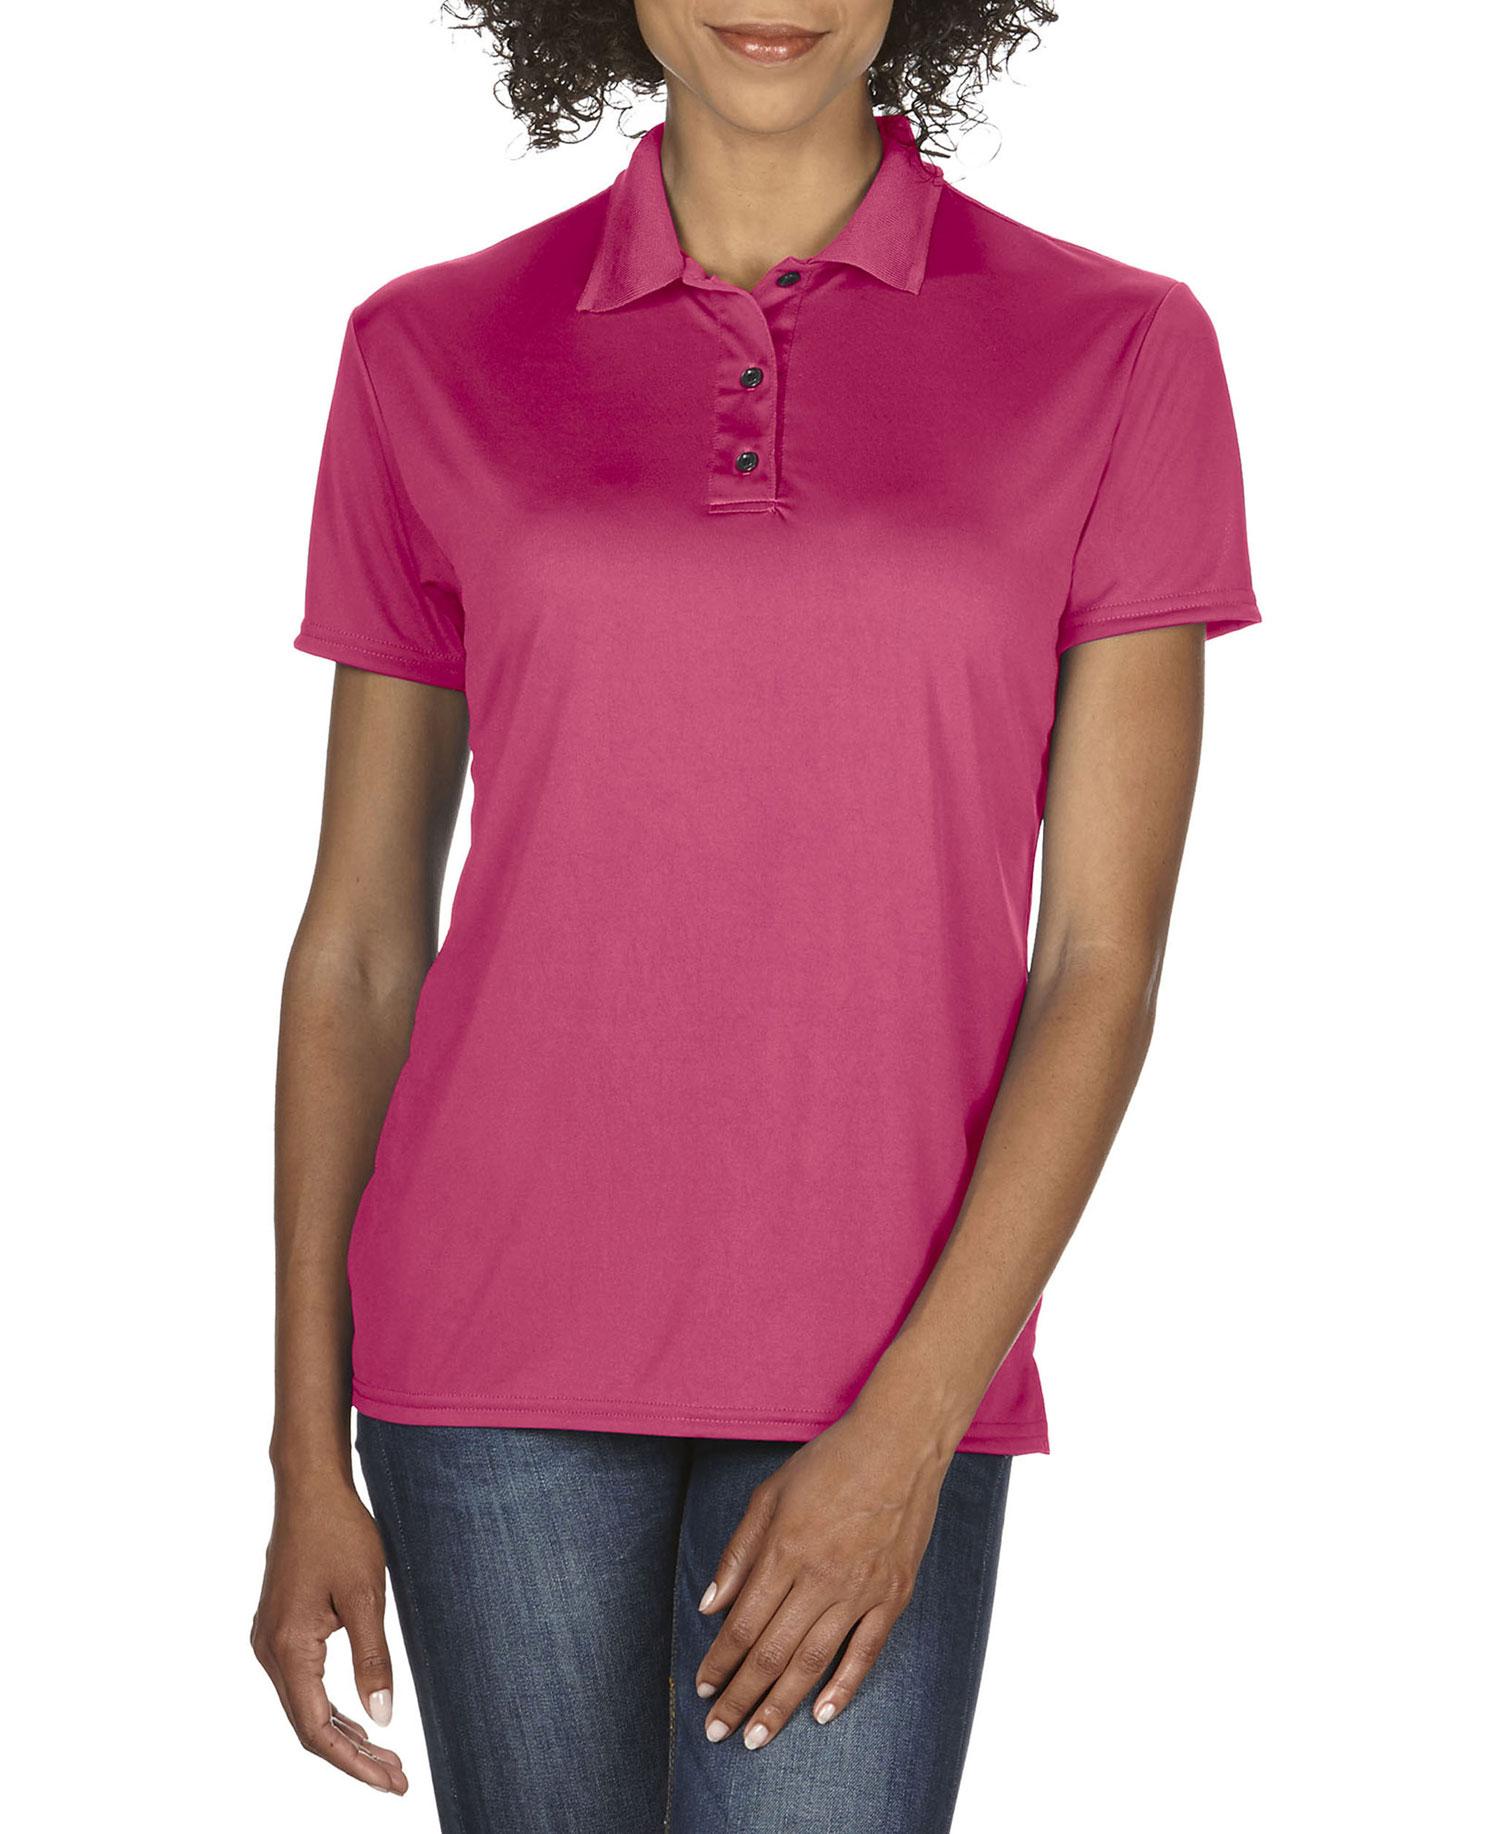 Gildan - G44800L Perf Ladies Jersey Sportshirt